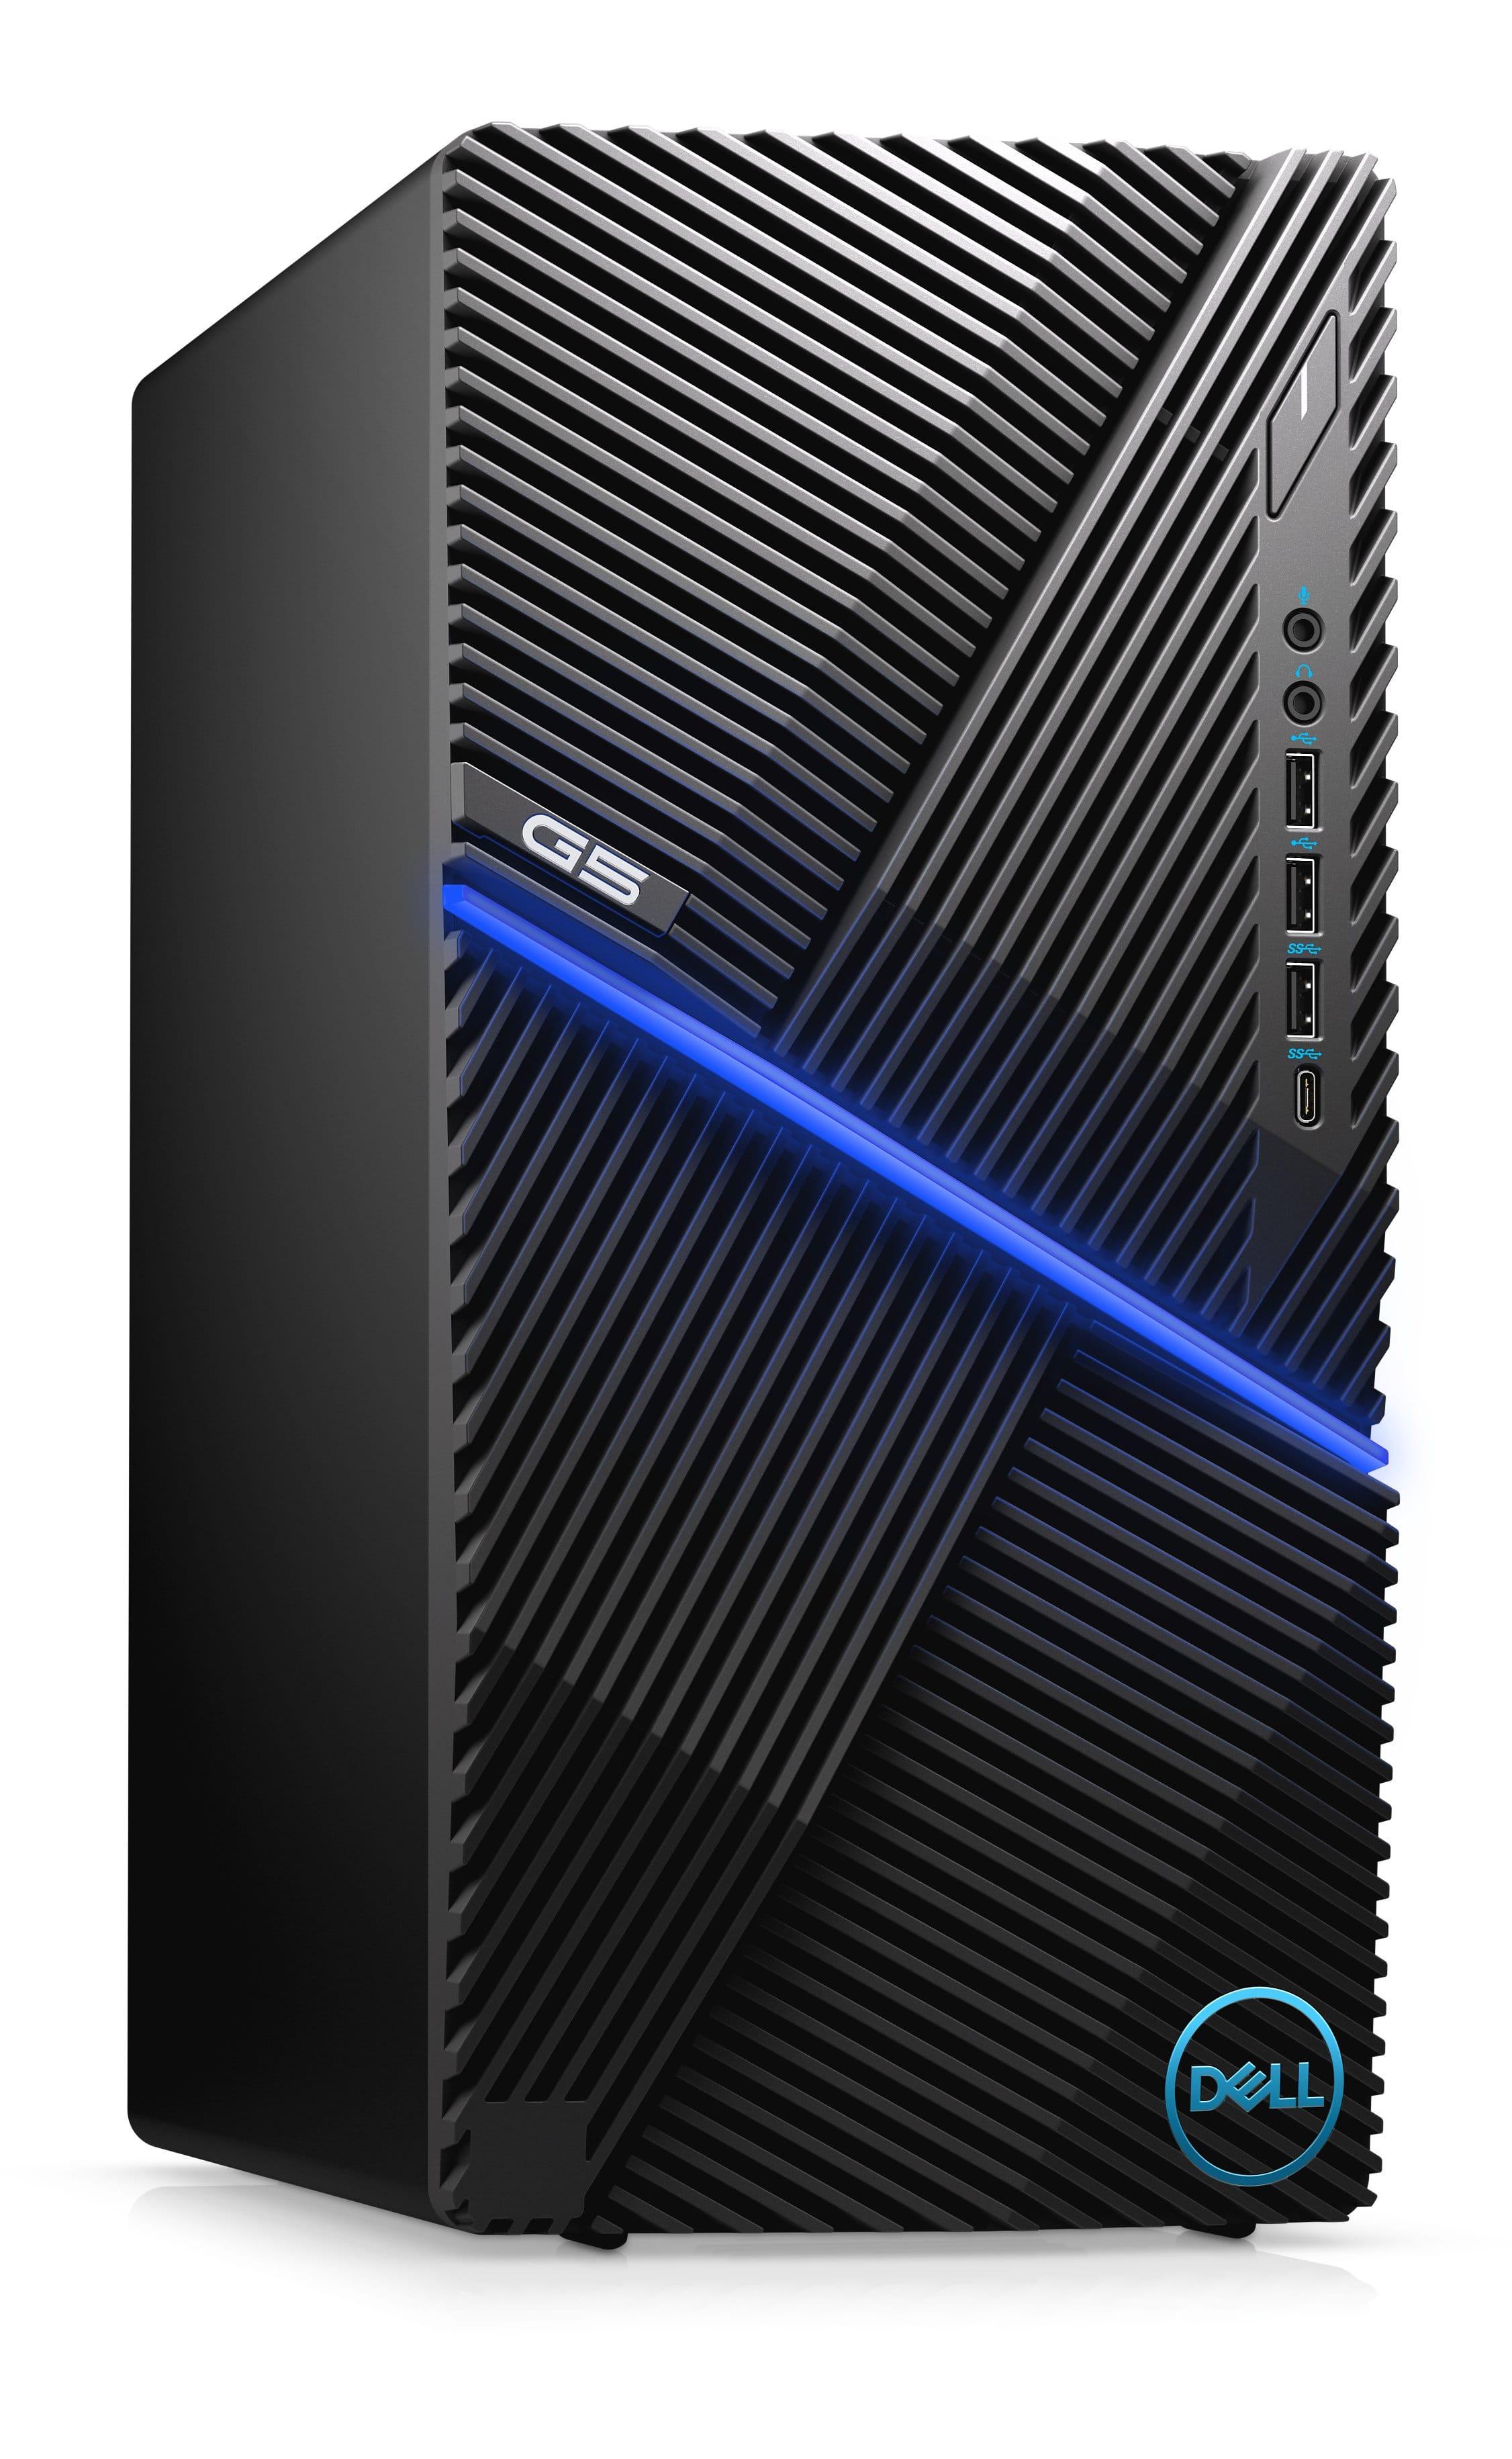 Dell G5 Gaming Desktop: i5-10400F, 8GB RAM, 512GB SSD, GTX 1650 SUPER